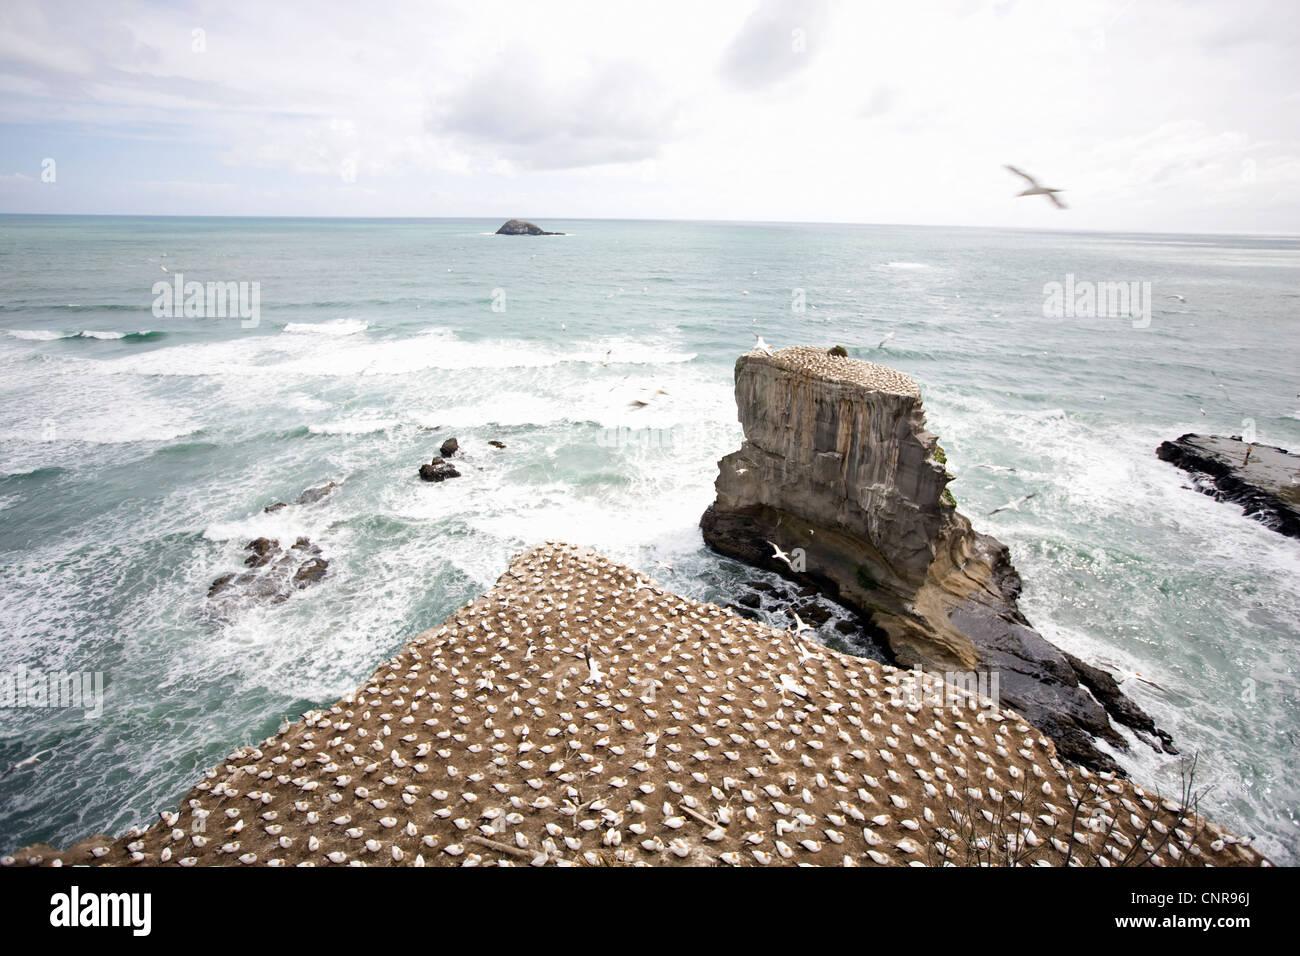 Craggy rock jutting into ocean - Stock Image